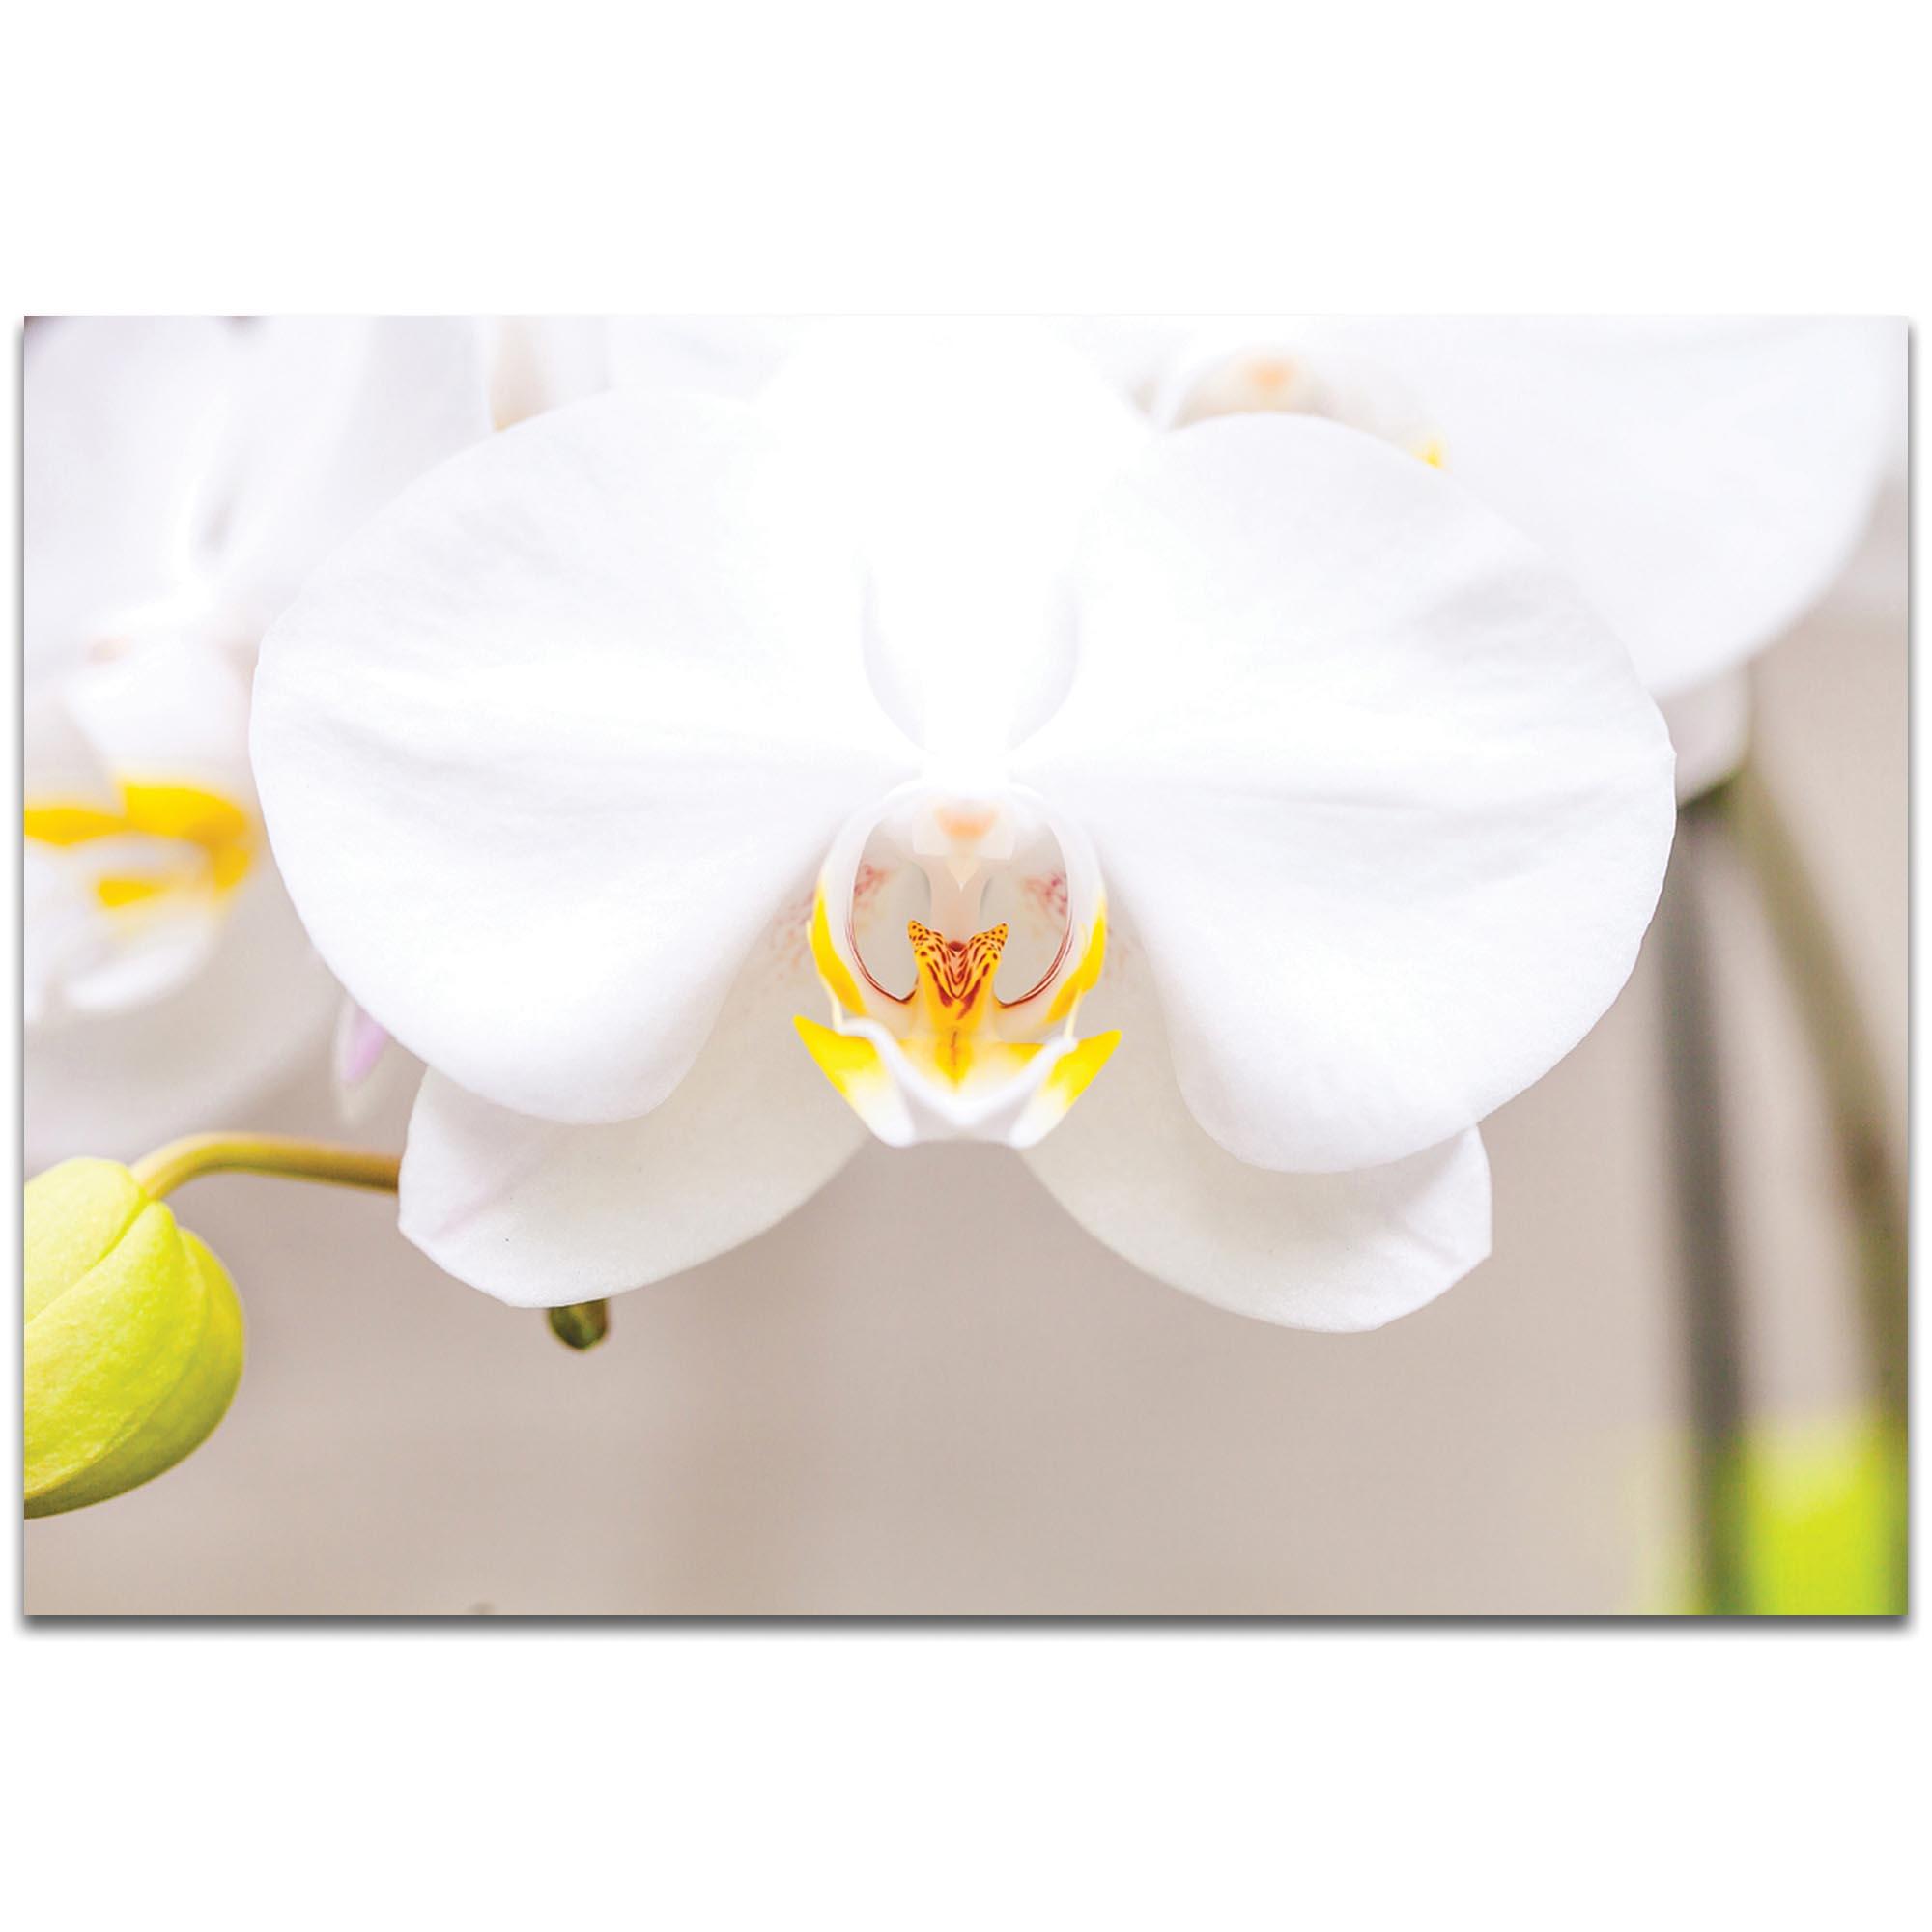 Nature Photography 'White Bloom' - Flower Blossom Art on Metal or Plexiglass